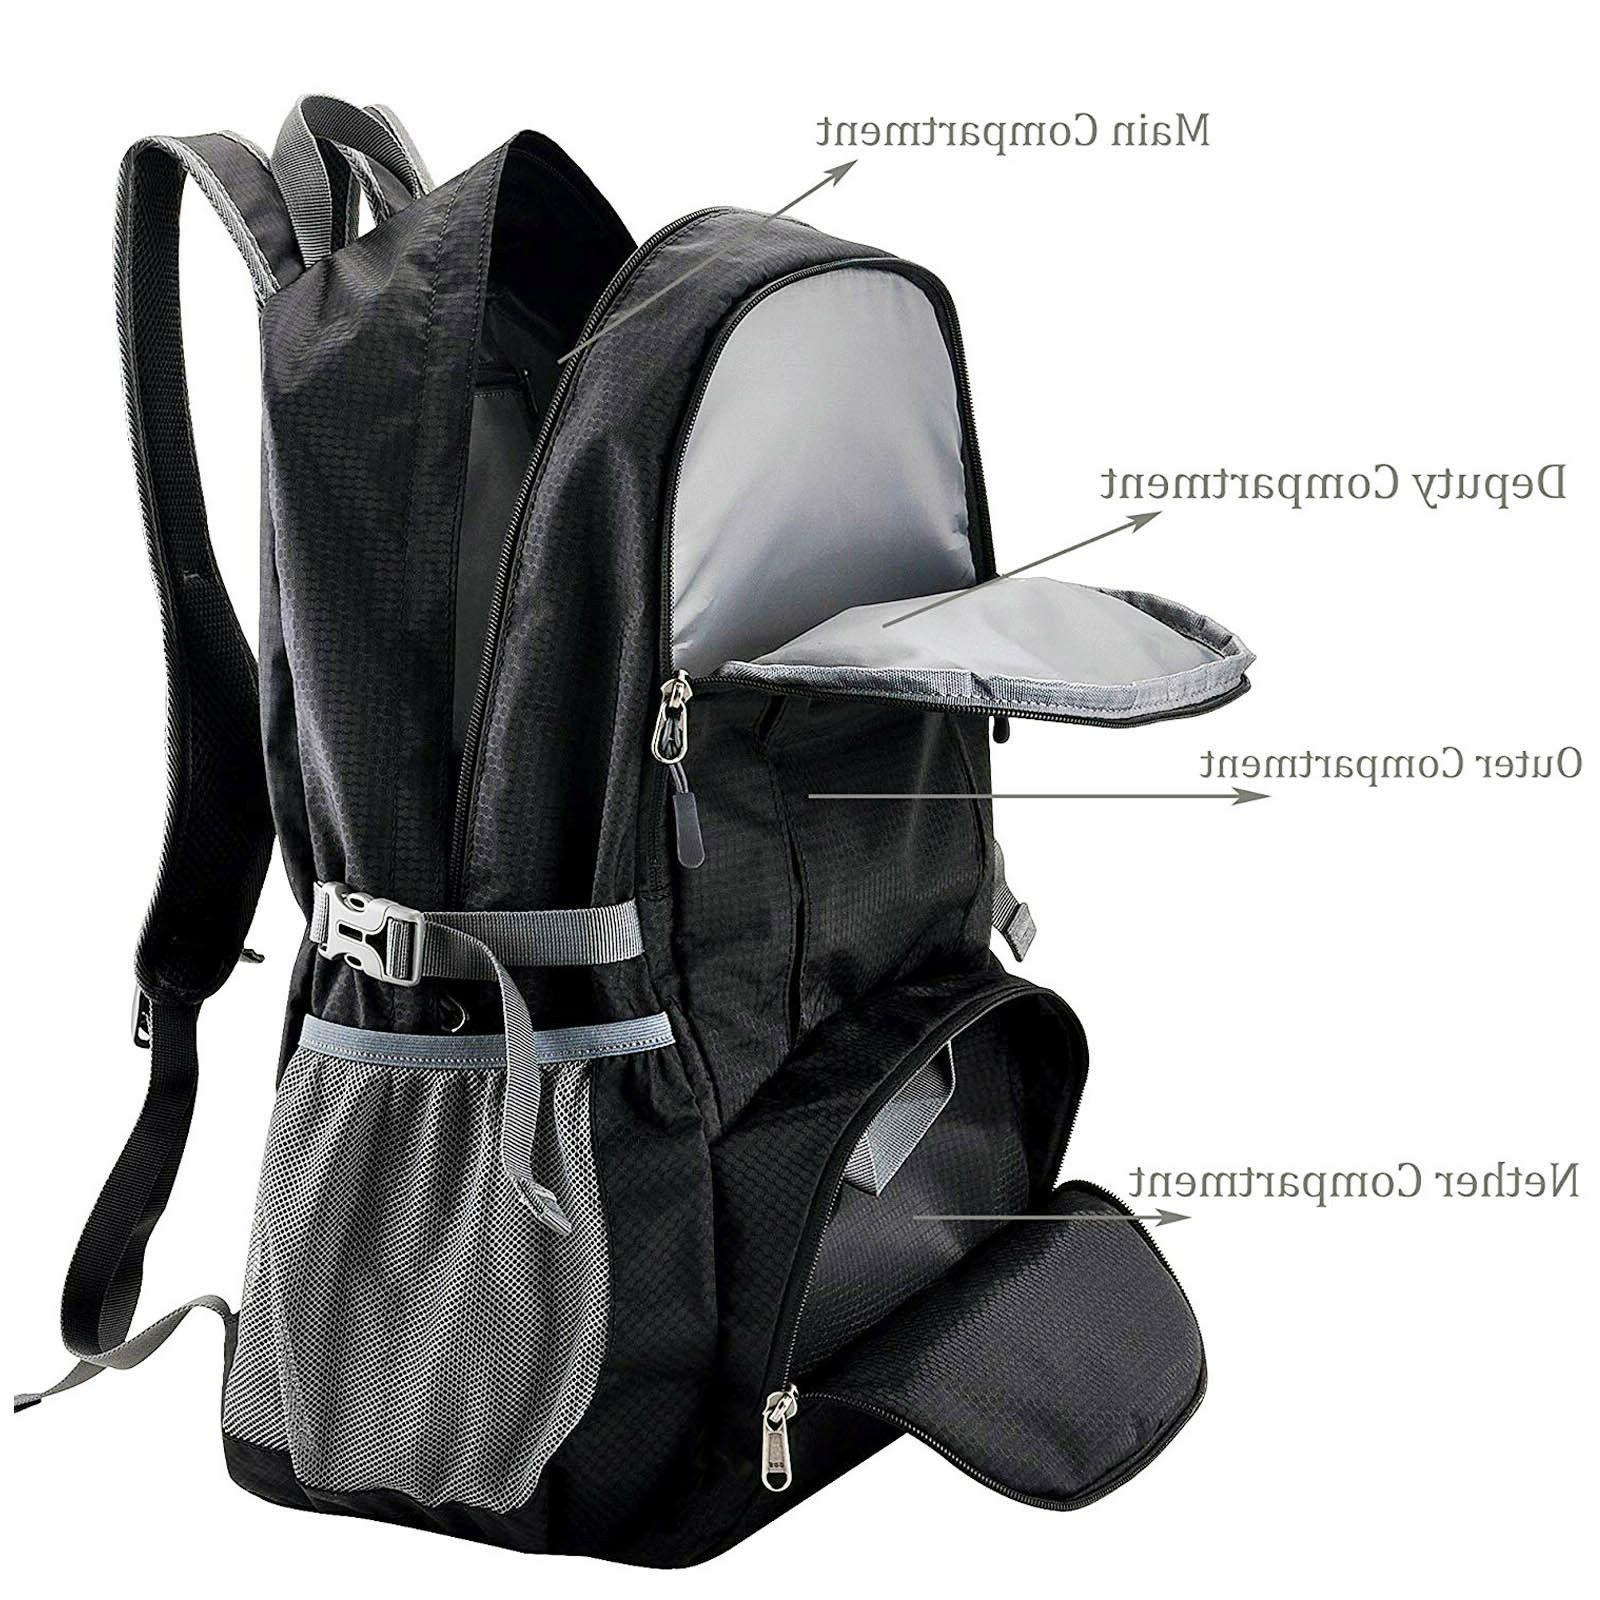 Multifunction Lightweight Backpack 35L